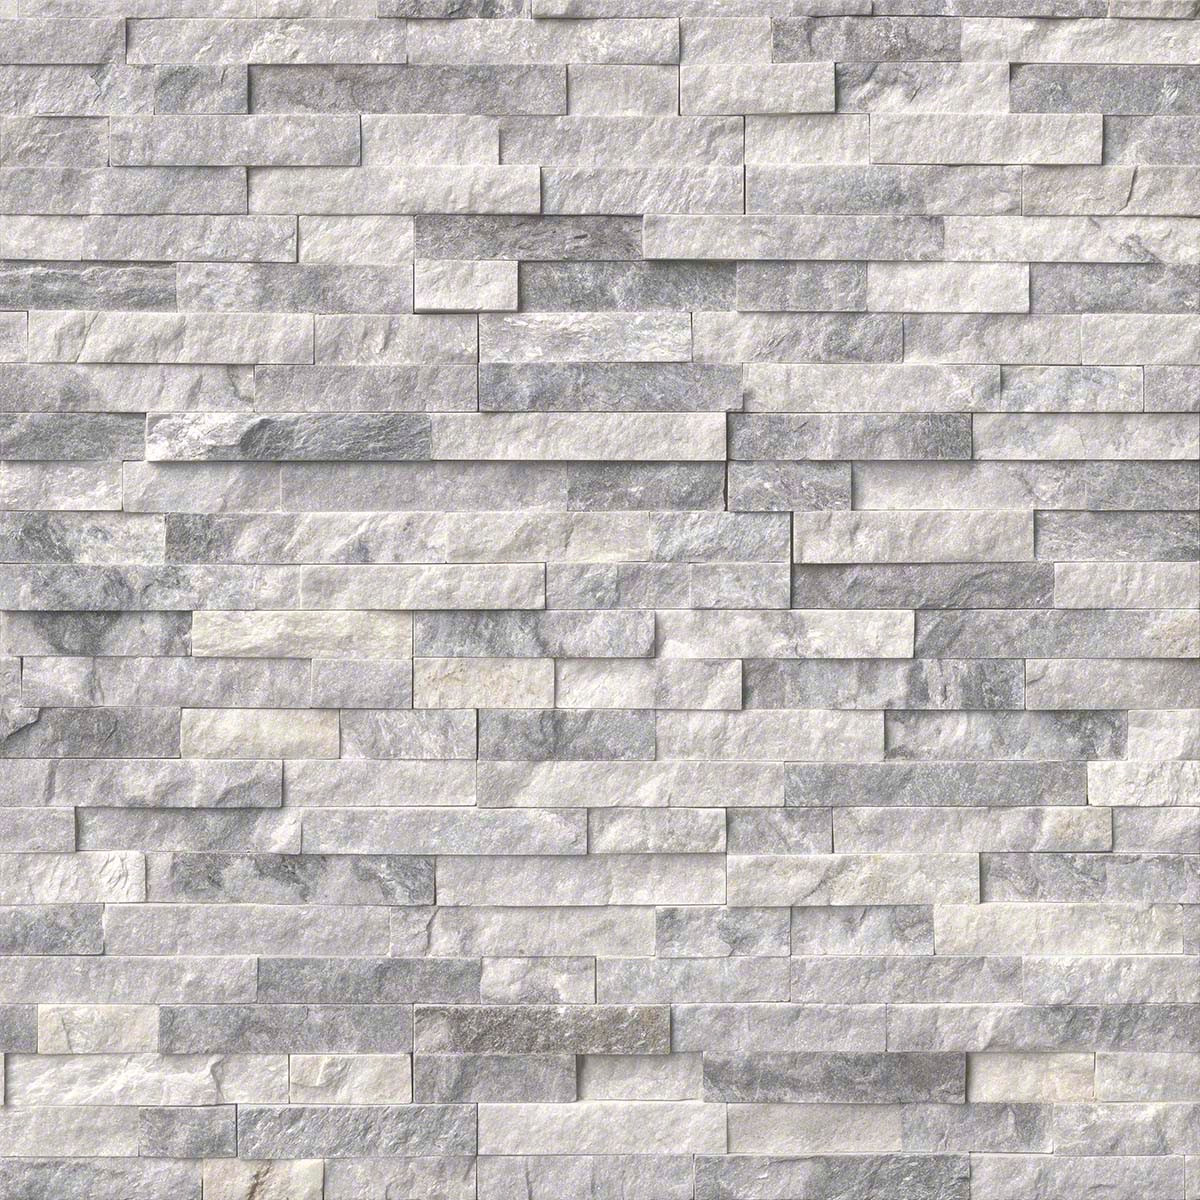 Crystal Graystone Splitface Ledgerstone Panels 6x24